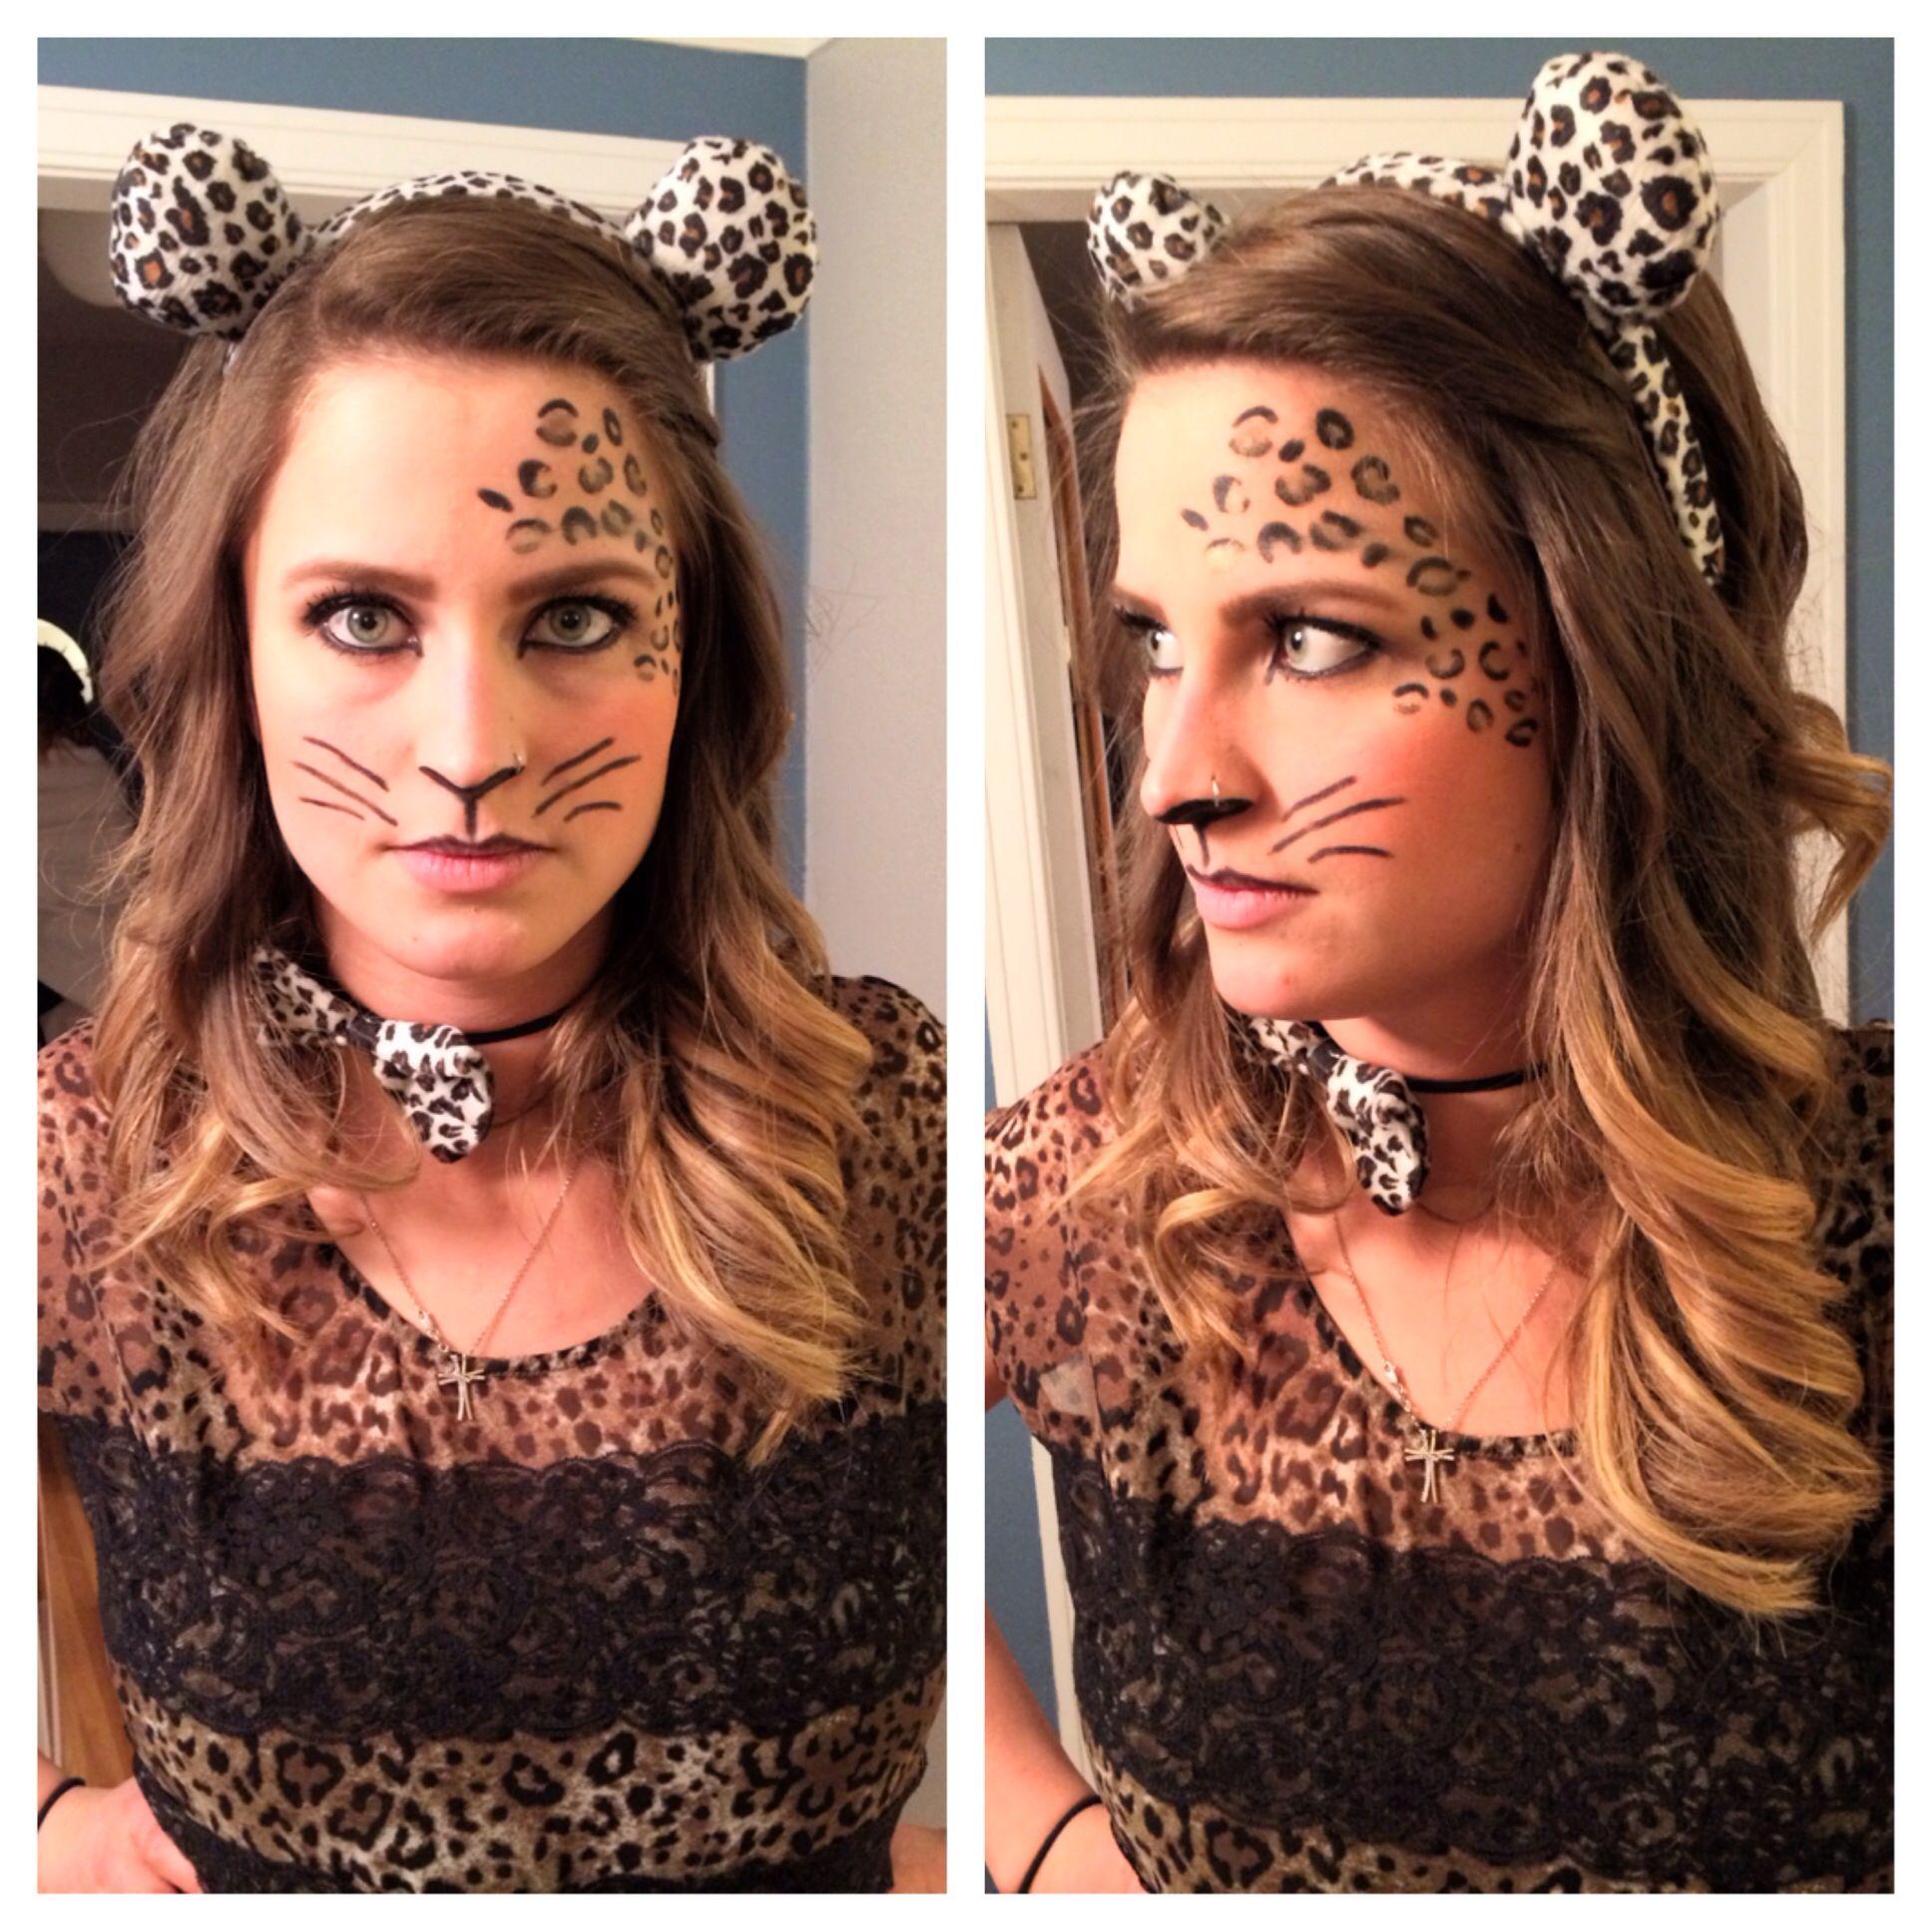 Cheetah makeup for Halloween using eyeliner and eyeshadow